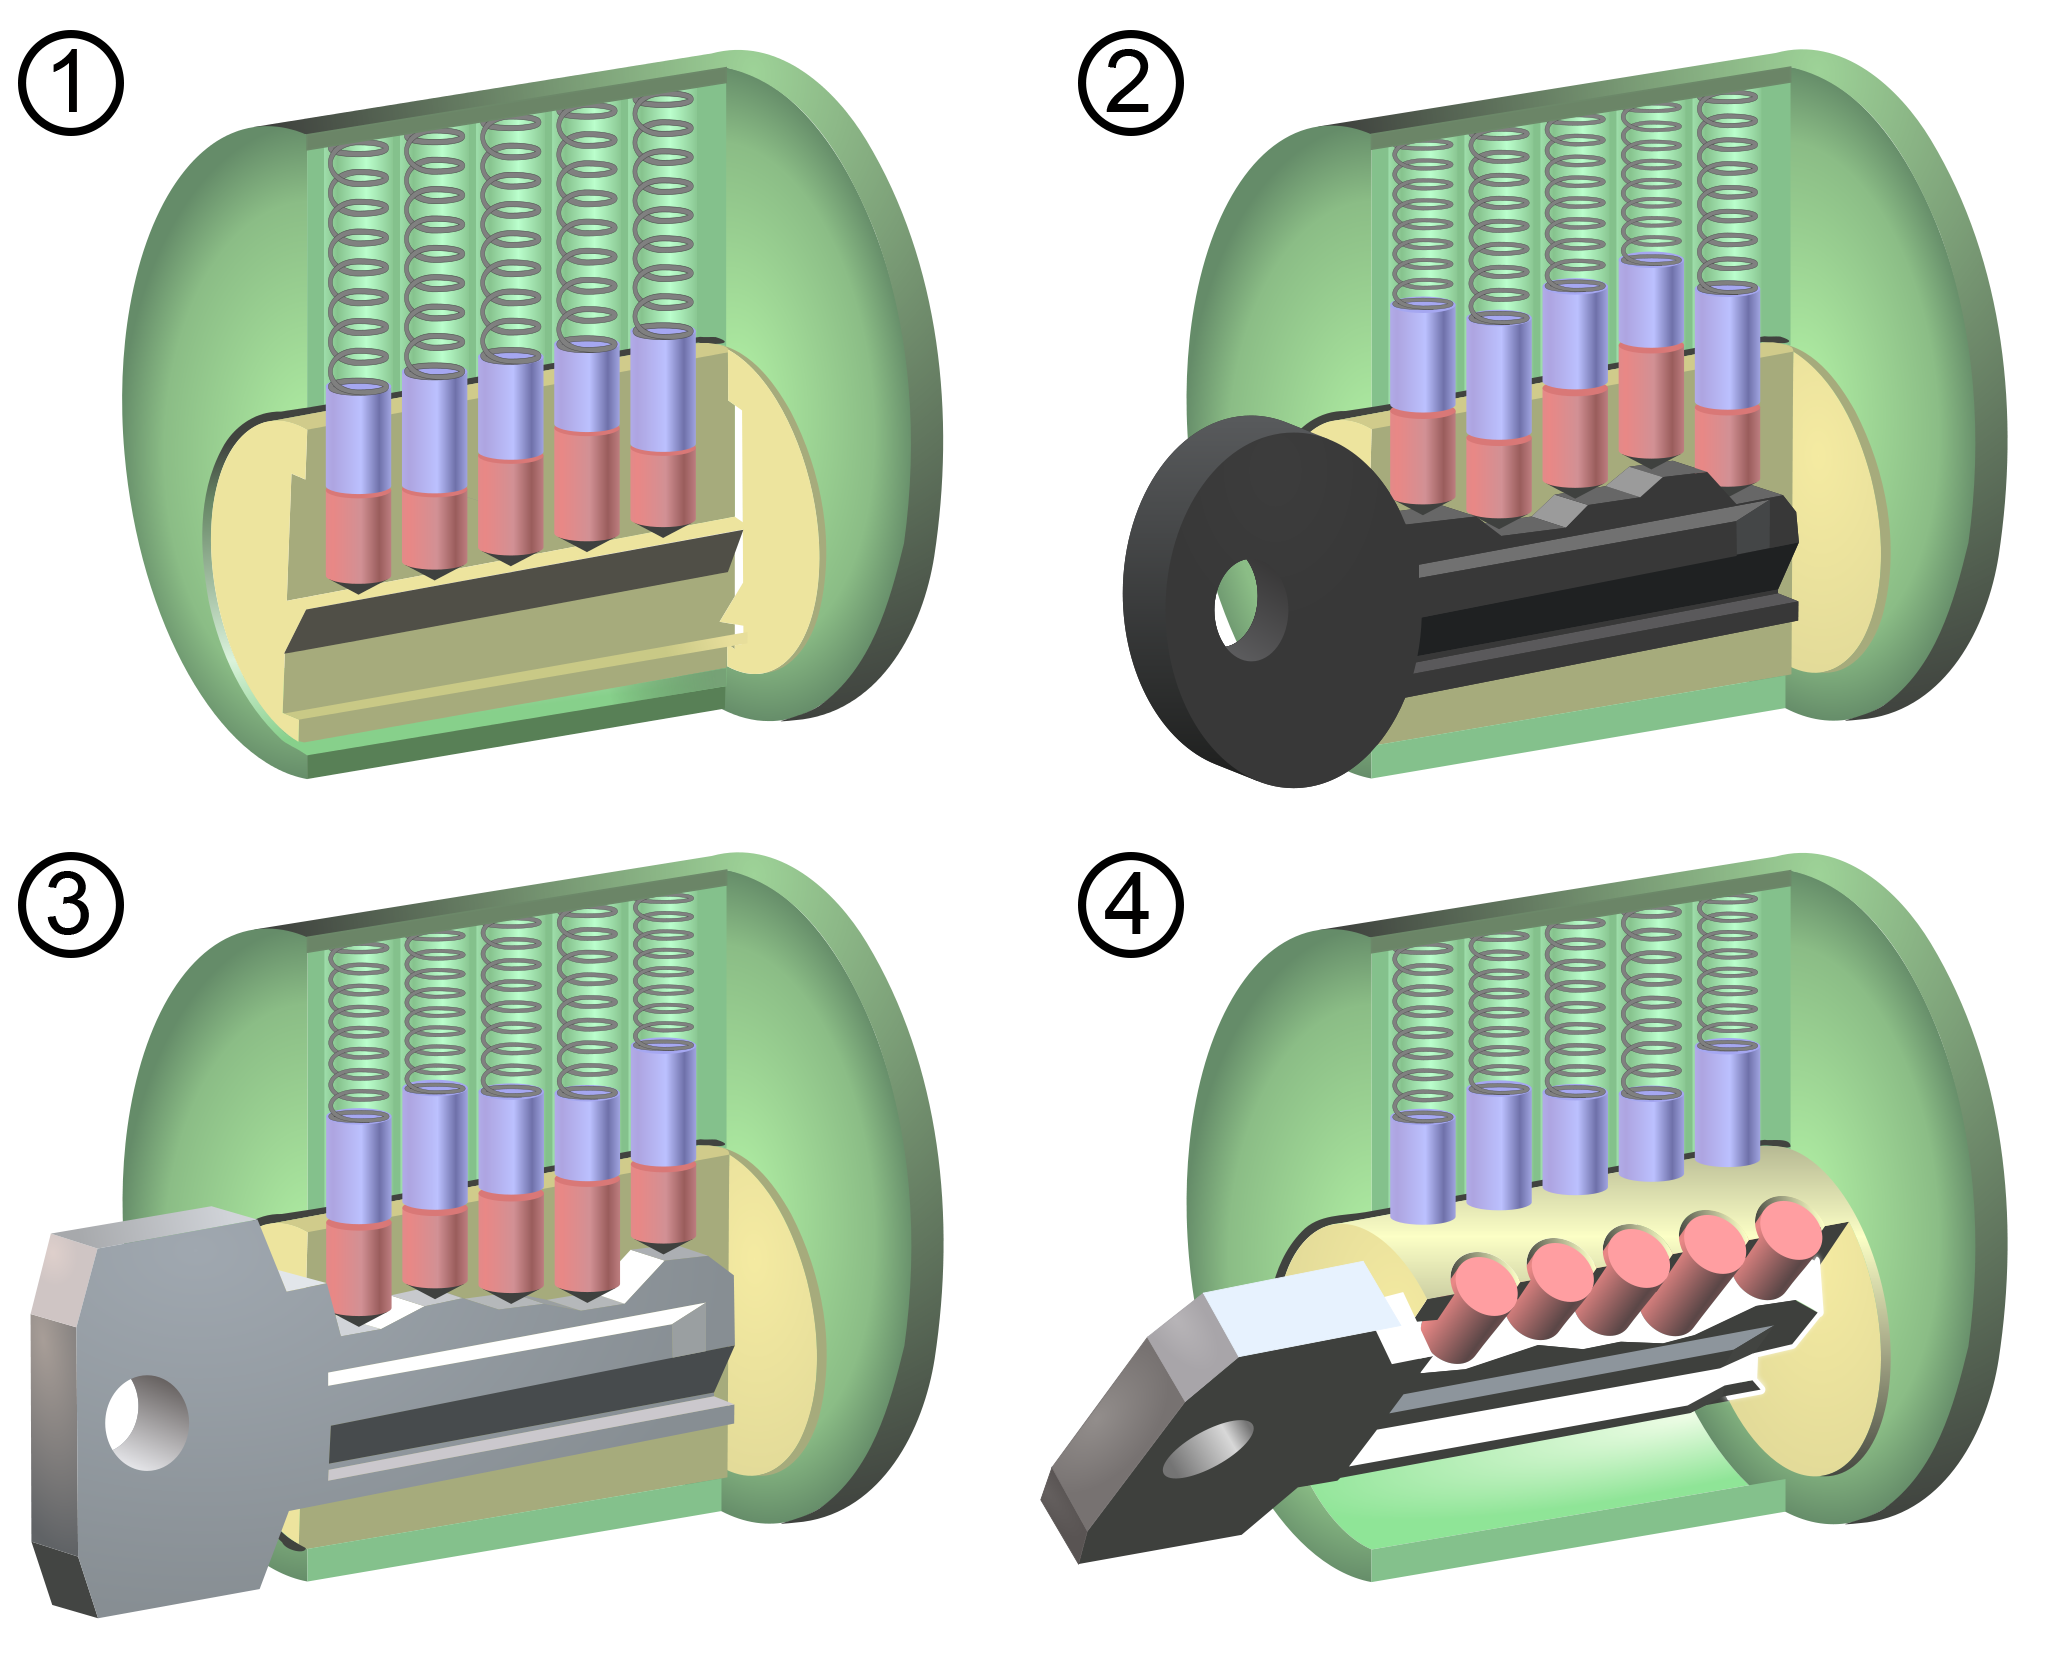 Pin And Tumbler Lock Diagram Pin Code Schlage Locks